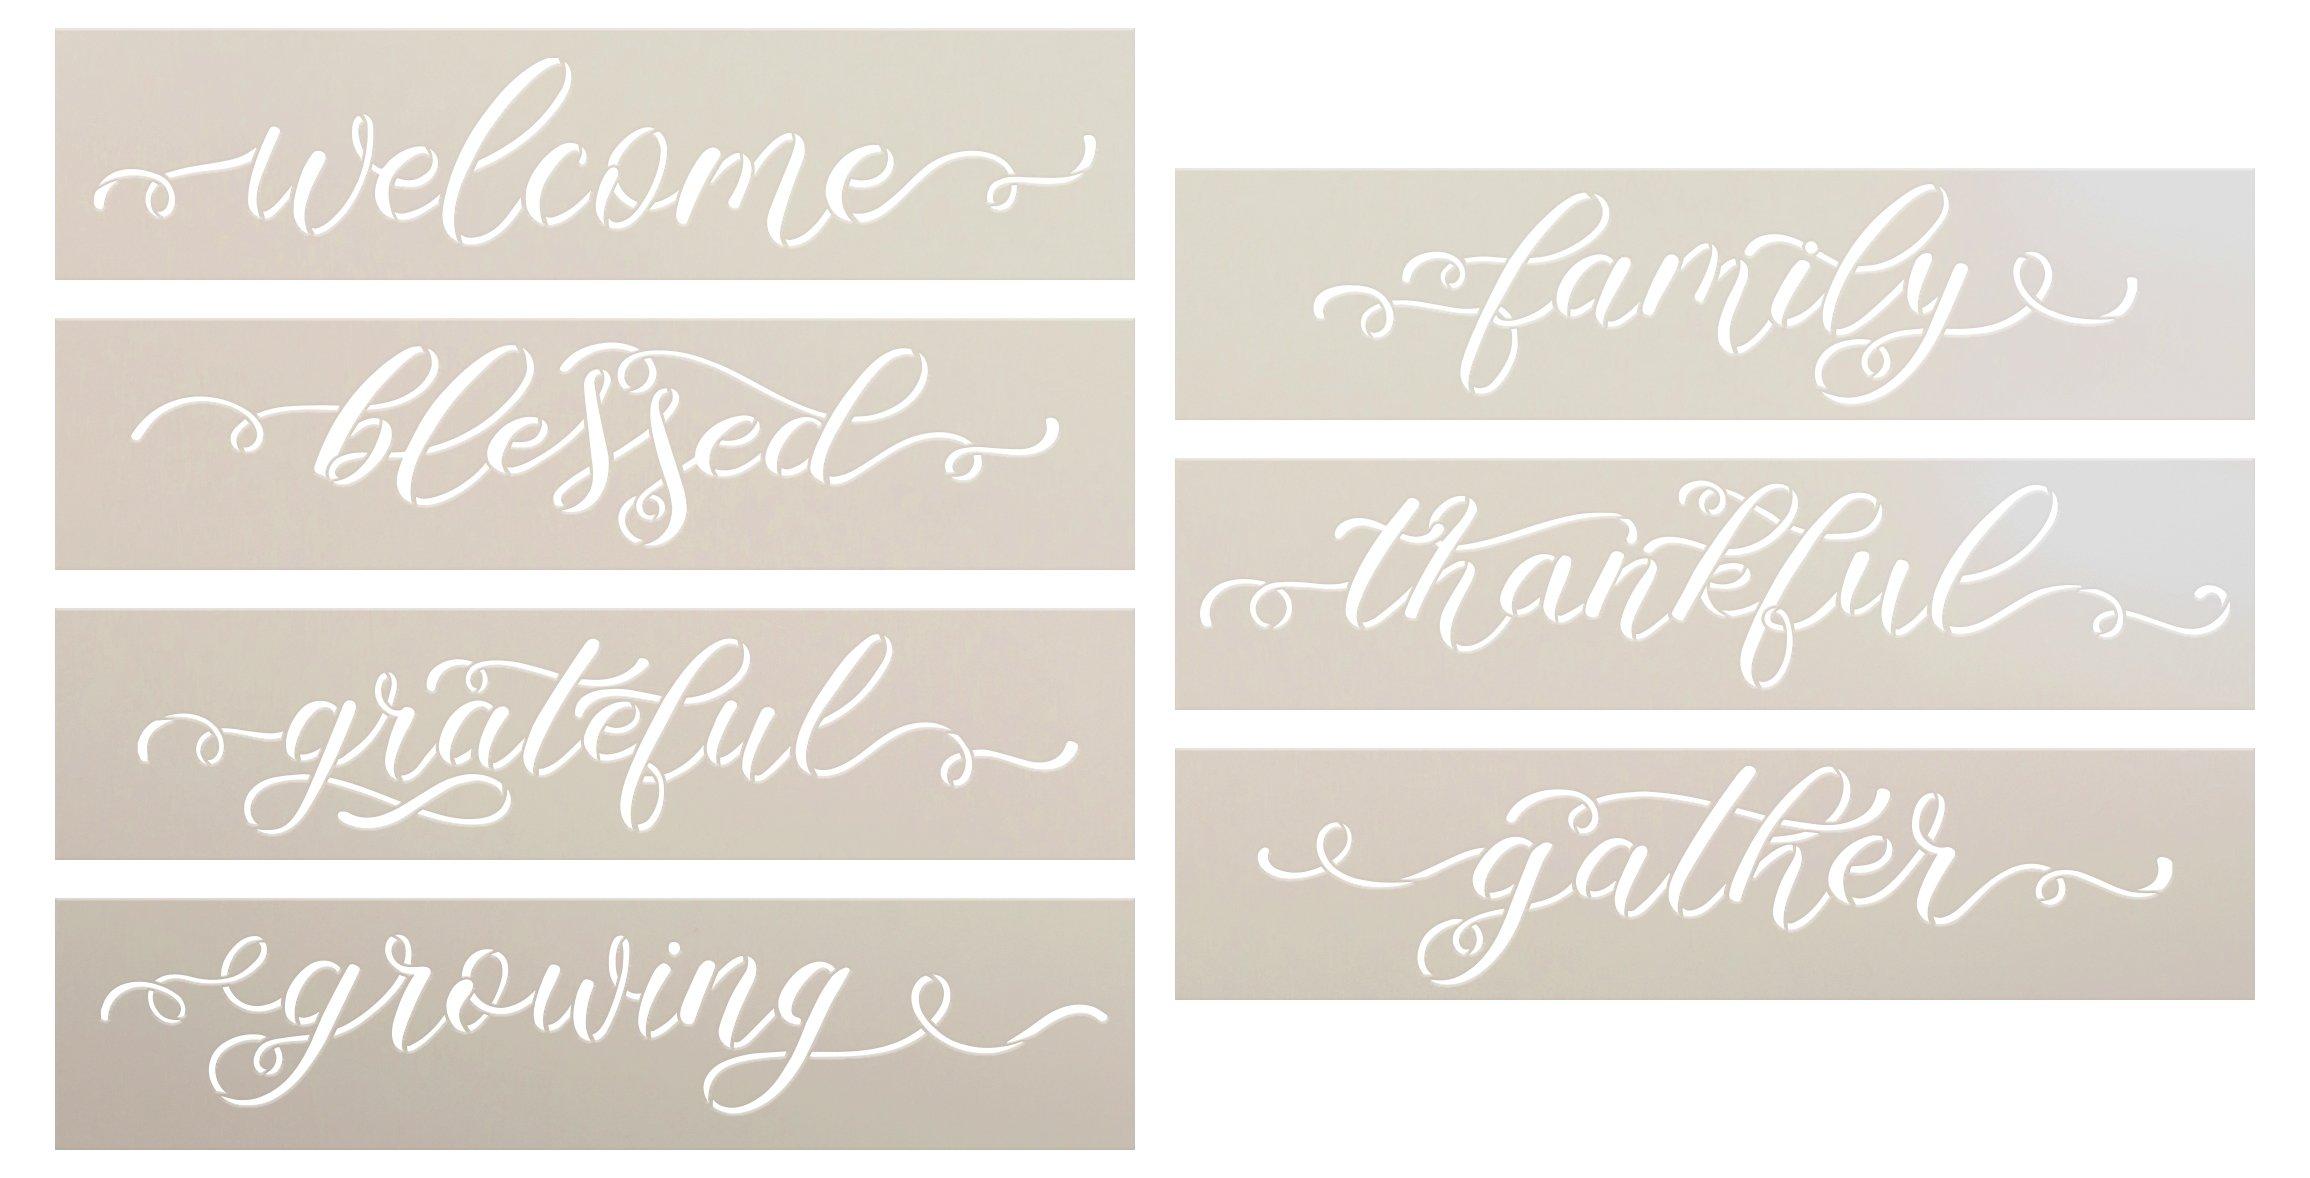 Farmhouse Cursive Script Word Stencil Set by StudioR12 | DIY Family Home Decor Gift | Craft & Paint Wood Sign | Reusable Mylar Template | Select Size